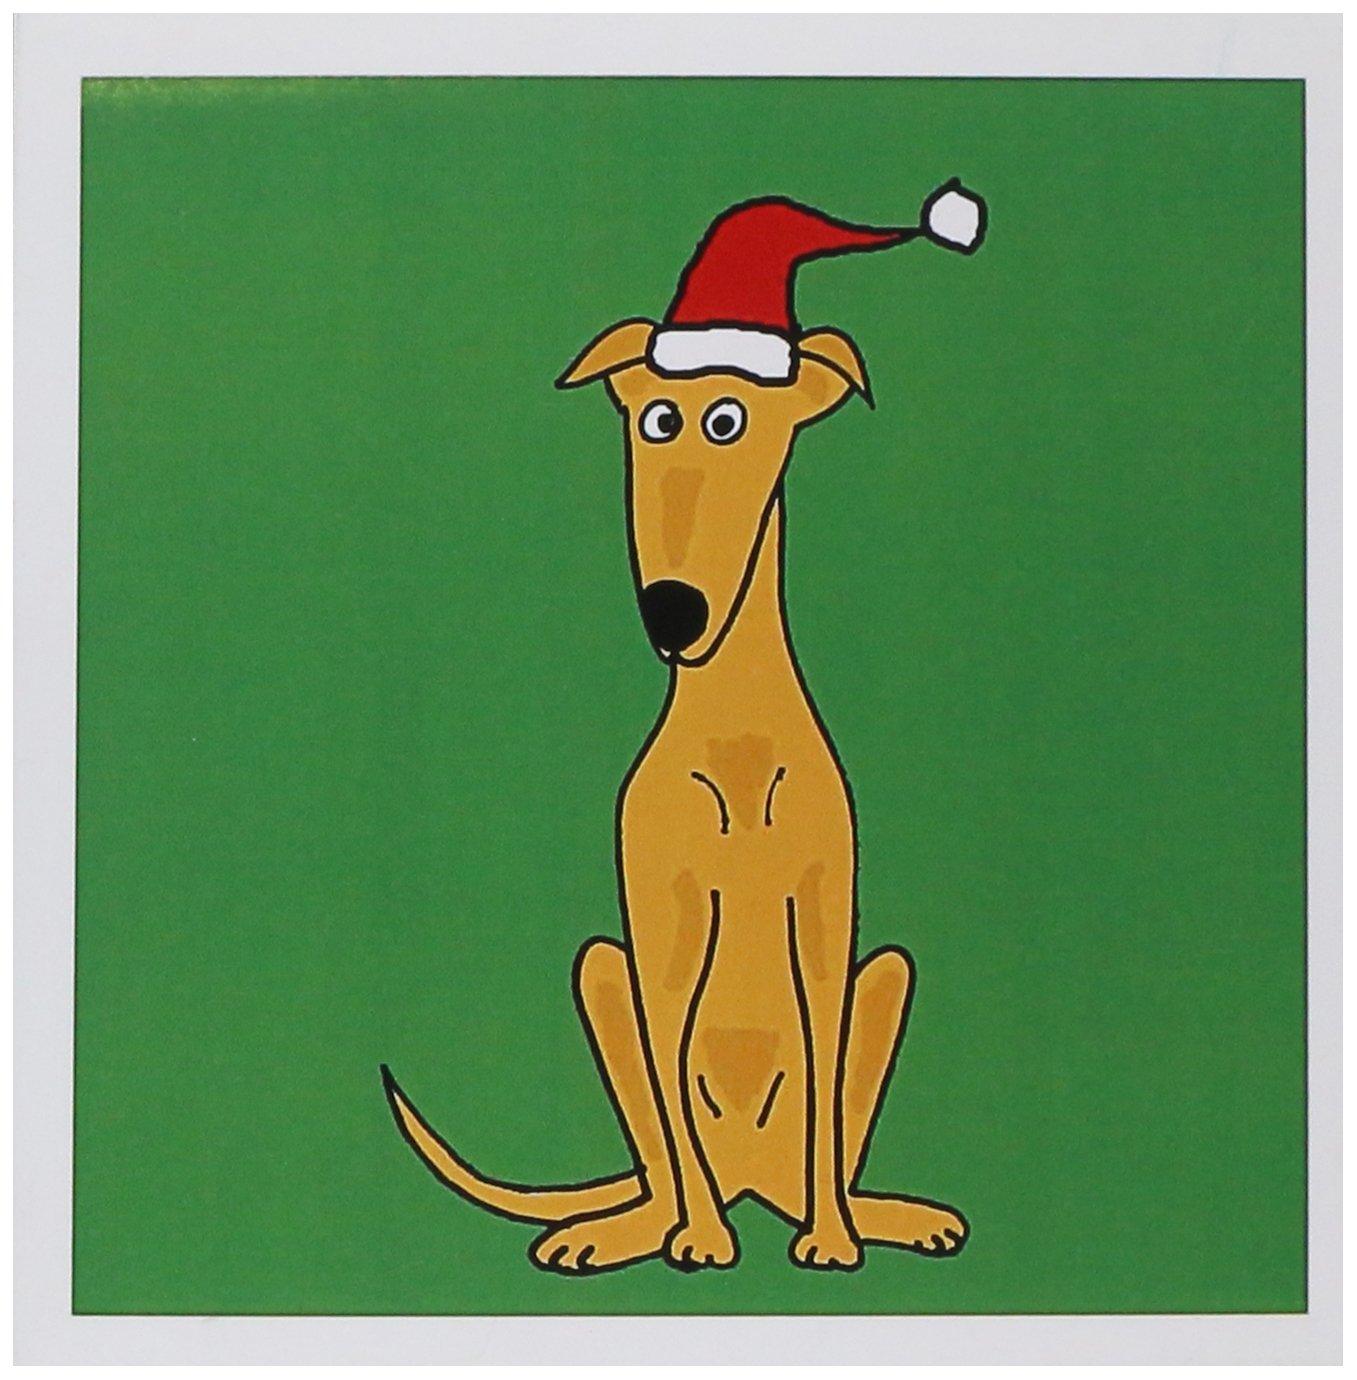 33246544b1143 Amazon.com   Funny Greyhound Puppy Dog in Santa Hat Christmas Art -  Greeting Cards